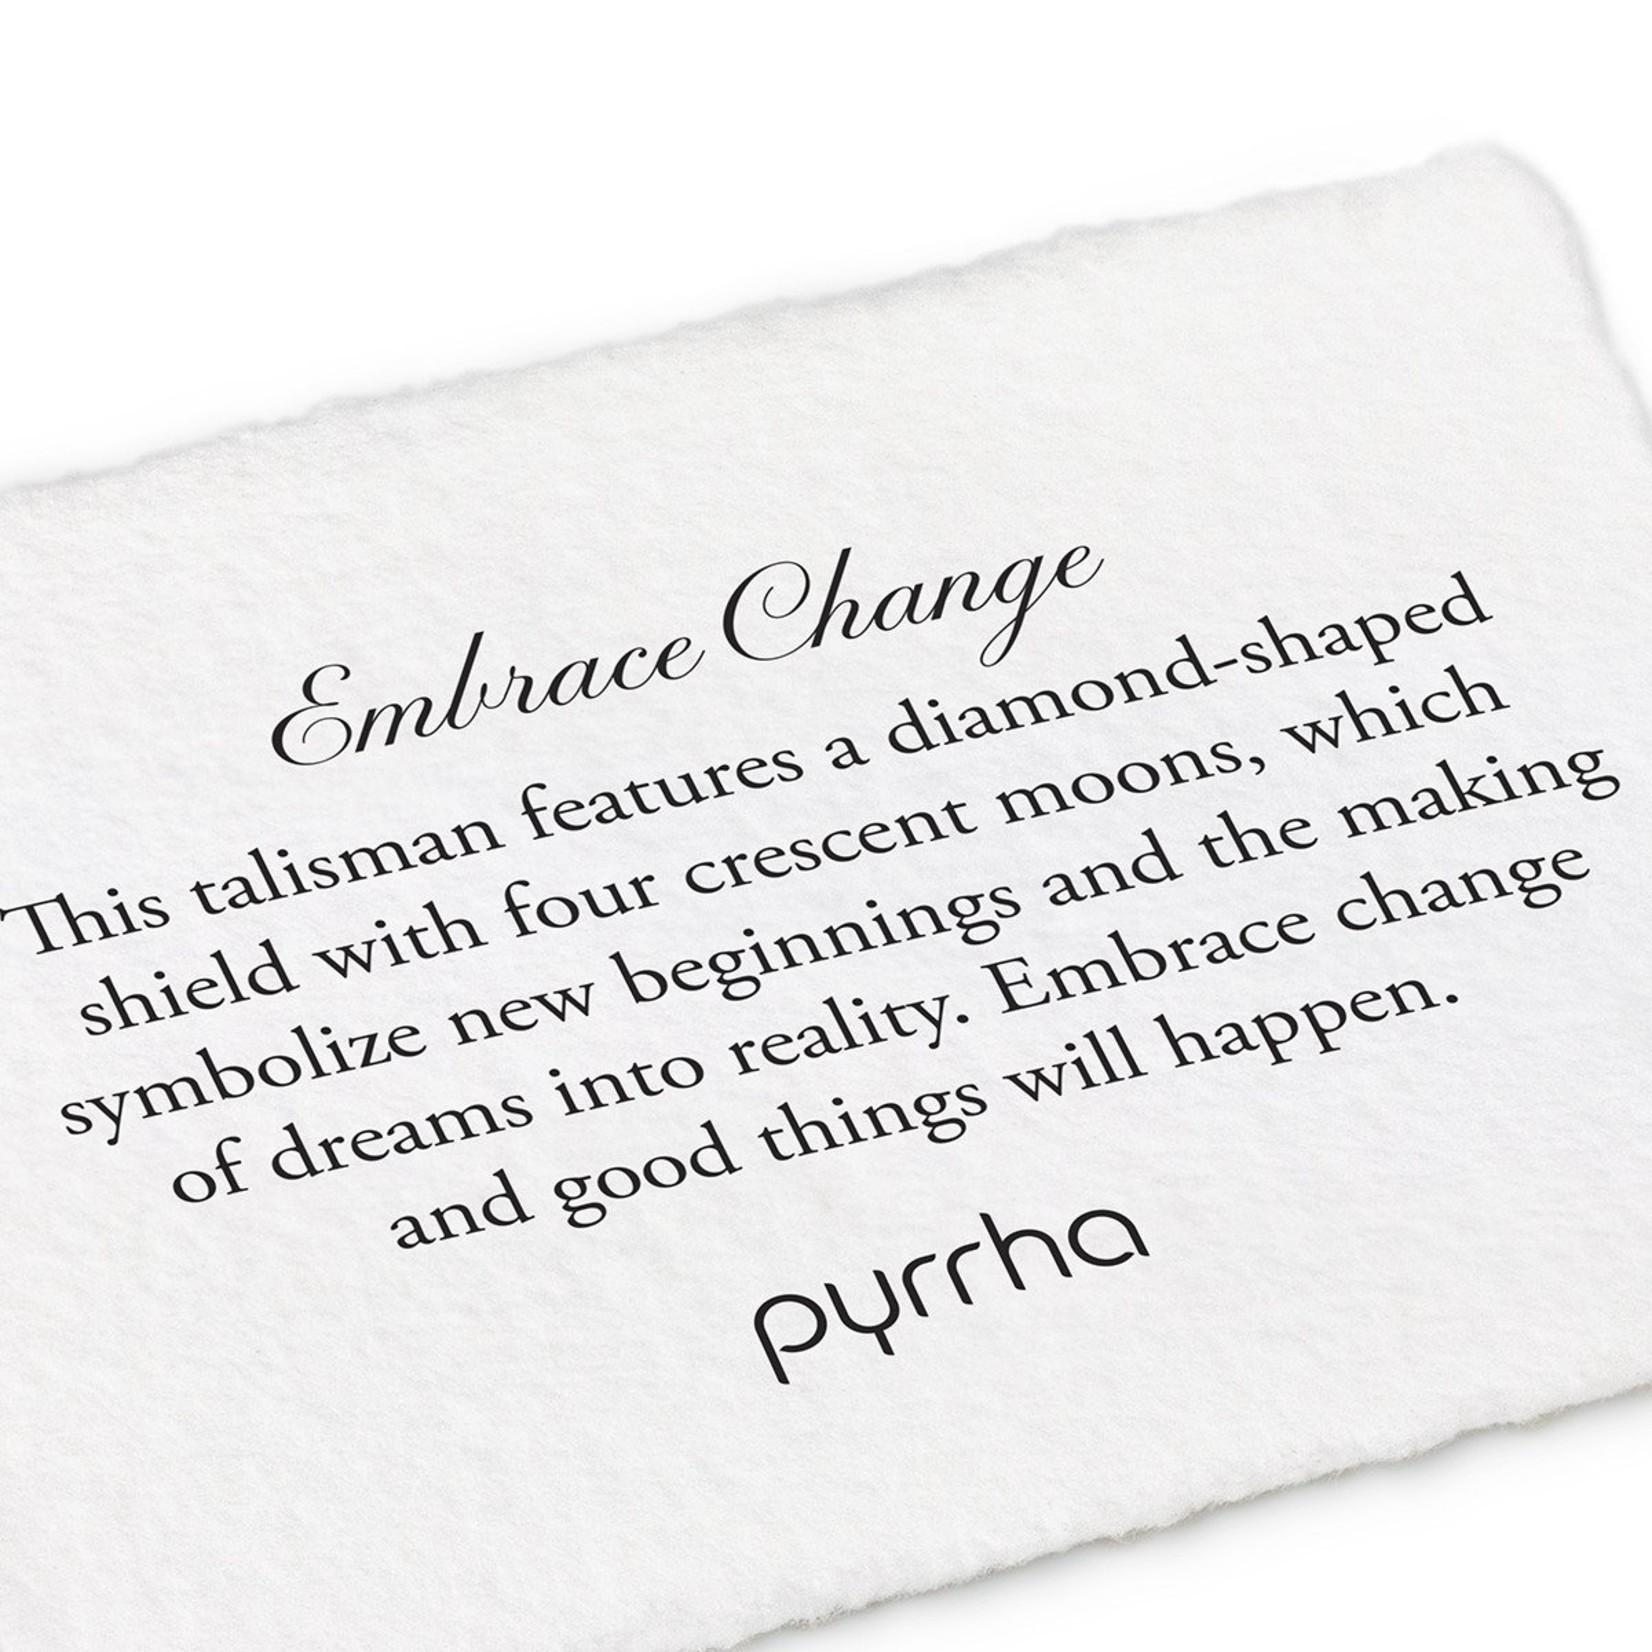 Pyrrha Embrace Change Signature Talisman